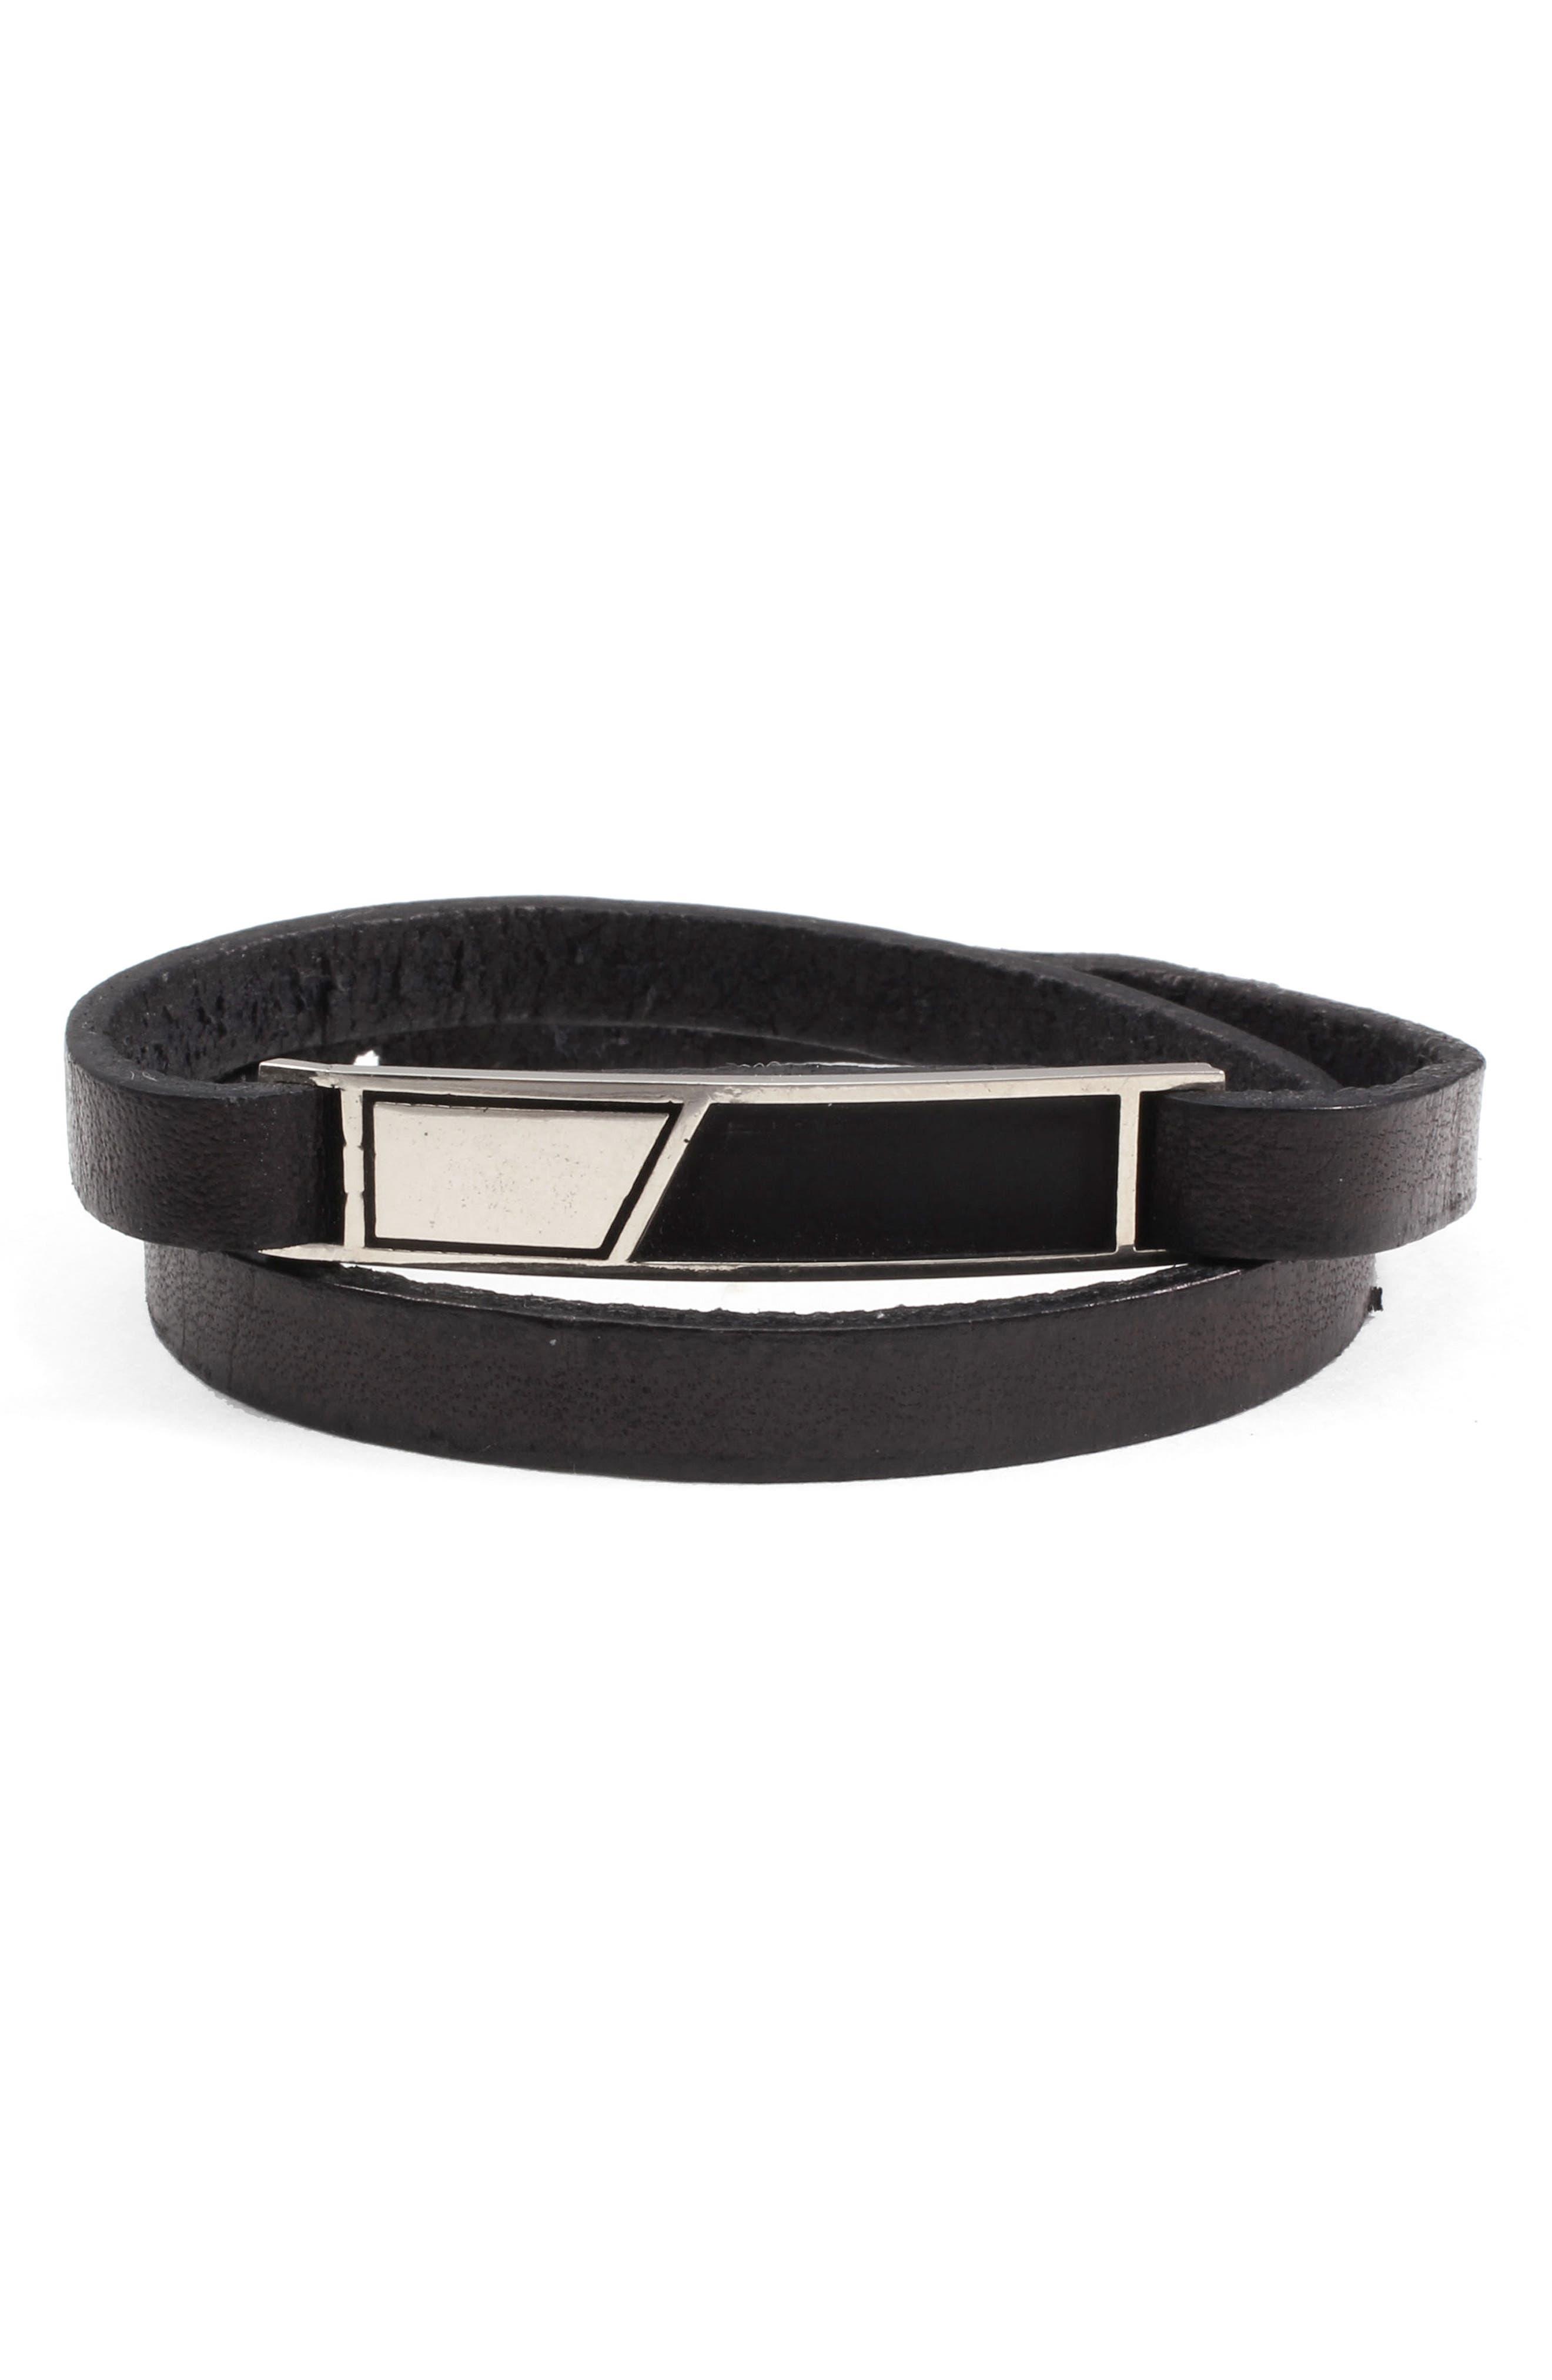 Dystopia ID Leather Wrap Bracelet,                         Main,                         color,